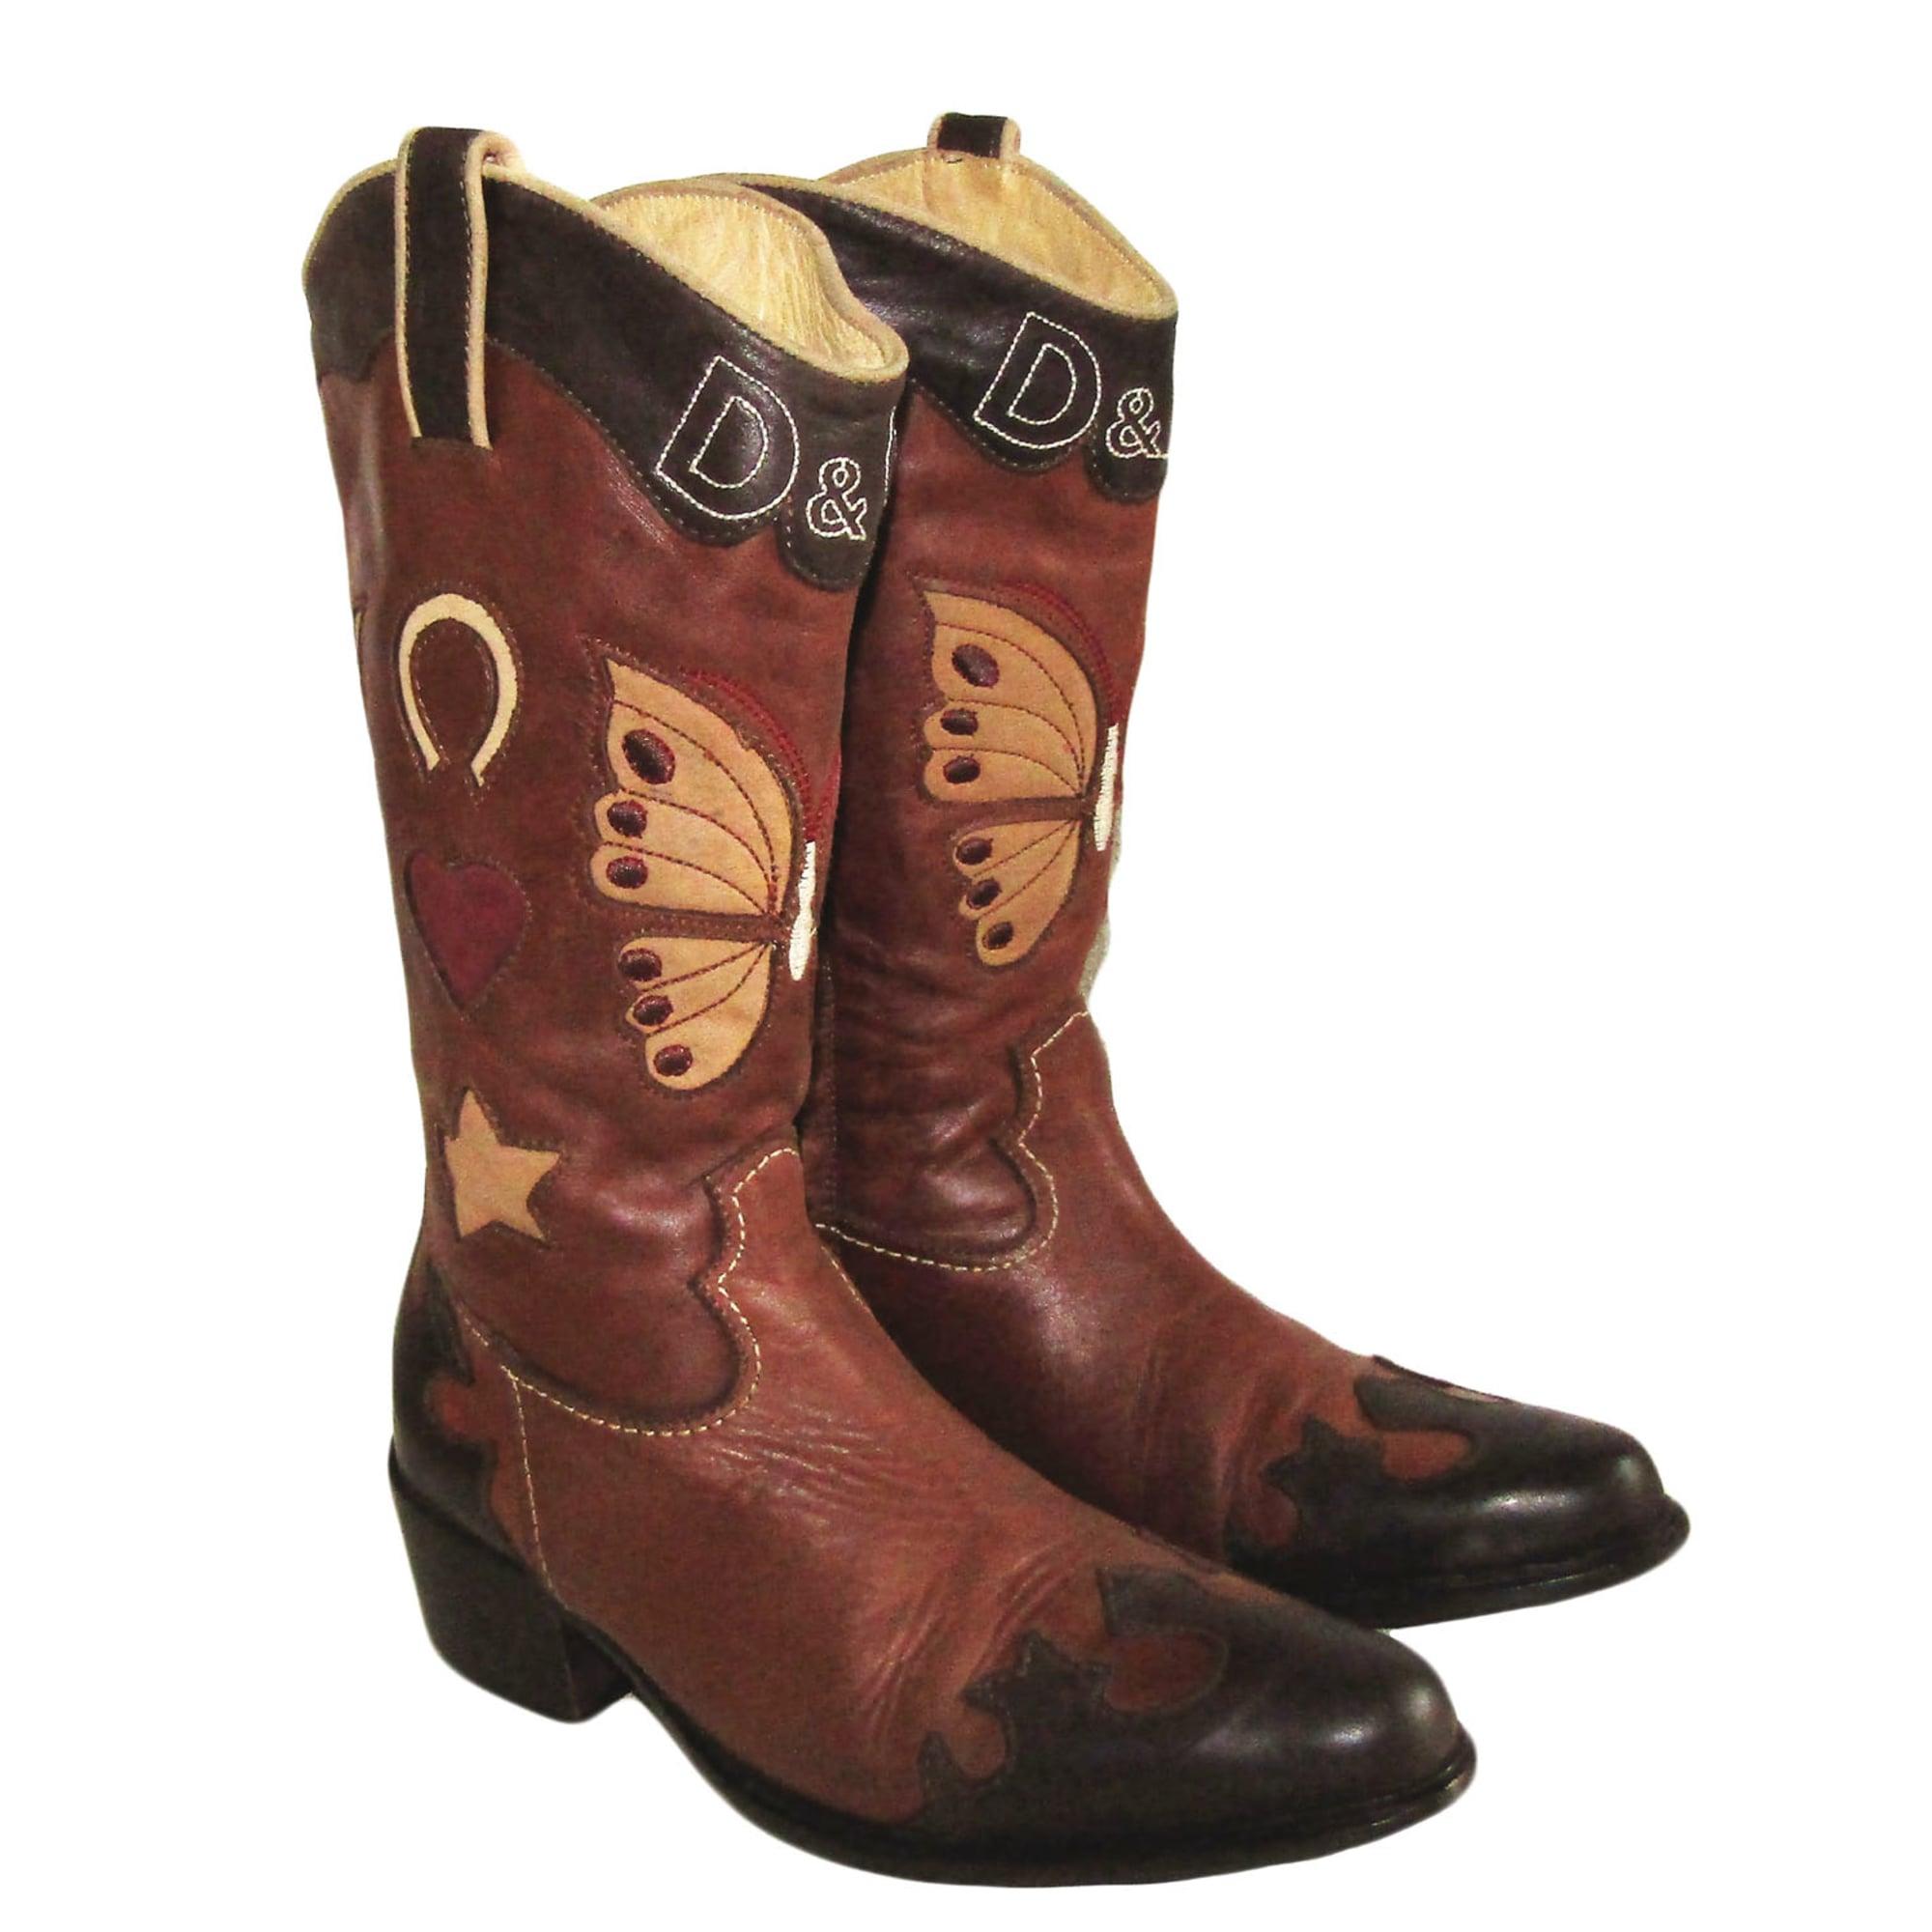 Santiags, bottes cowboy DOLCE \u0026 GABBANA Marron